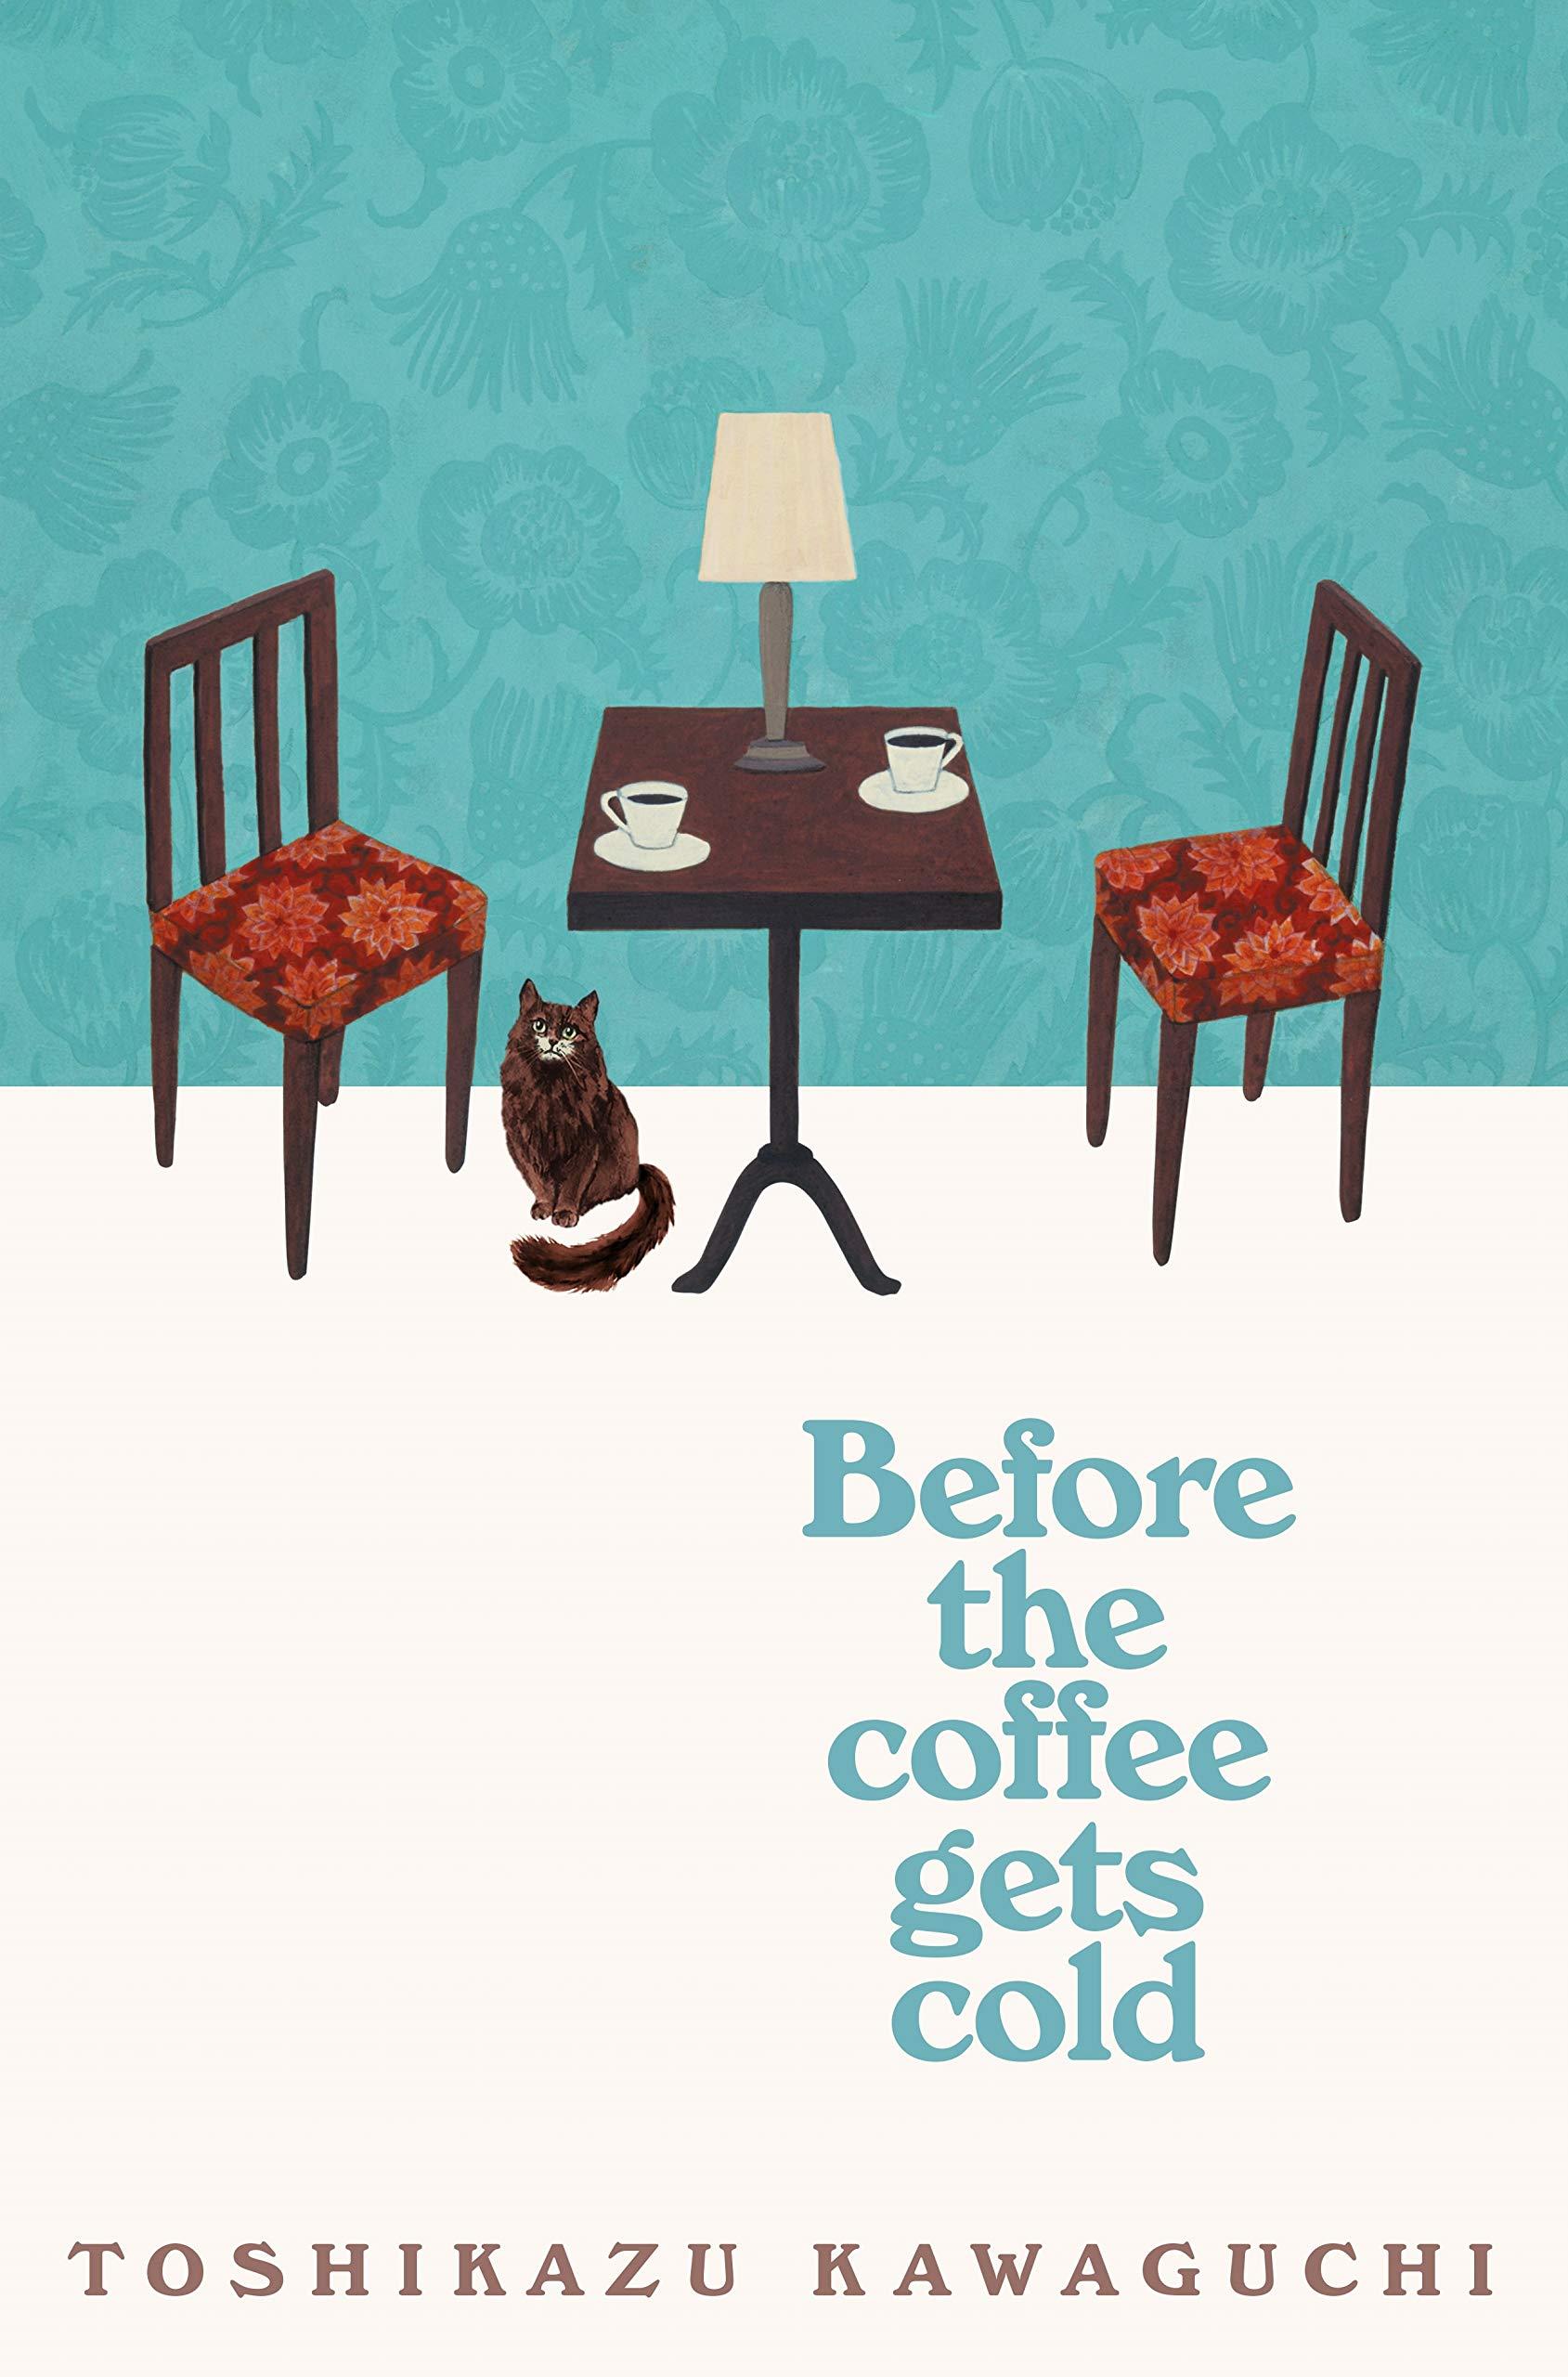 Before the Coffee Gets Cold: Amazon.co.uk: Kawaguchi, Toshikazu,  Trousselot, Geoffrey: 9781529029581: Books